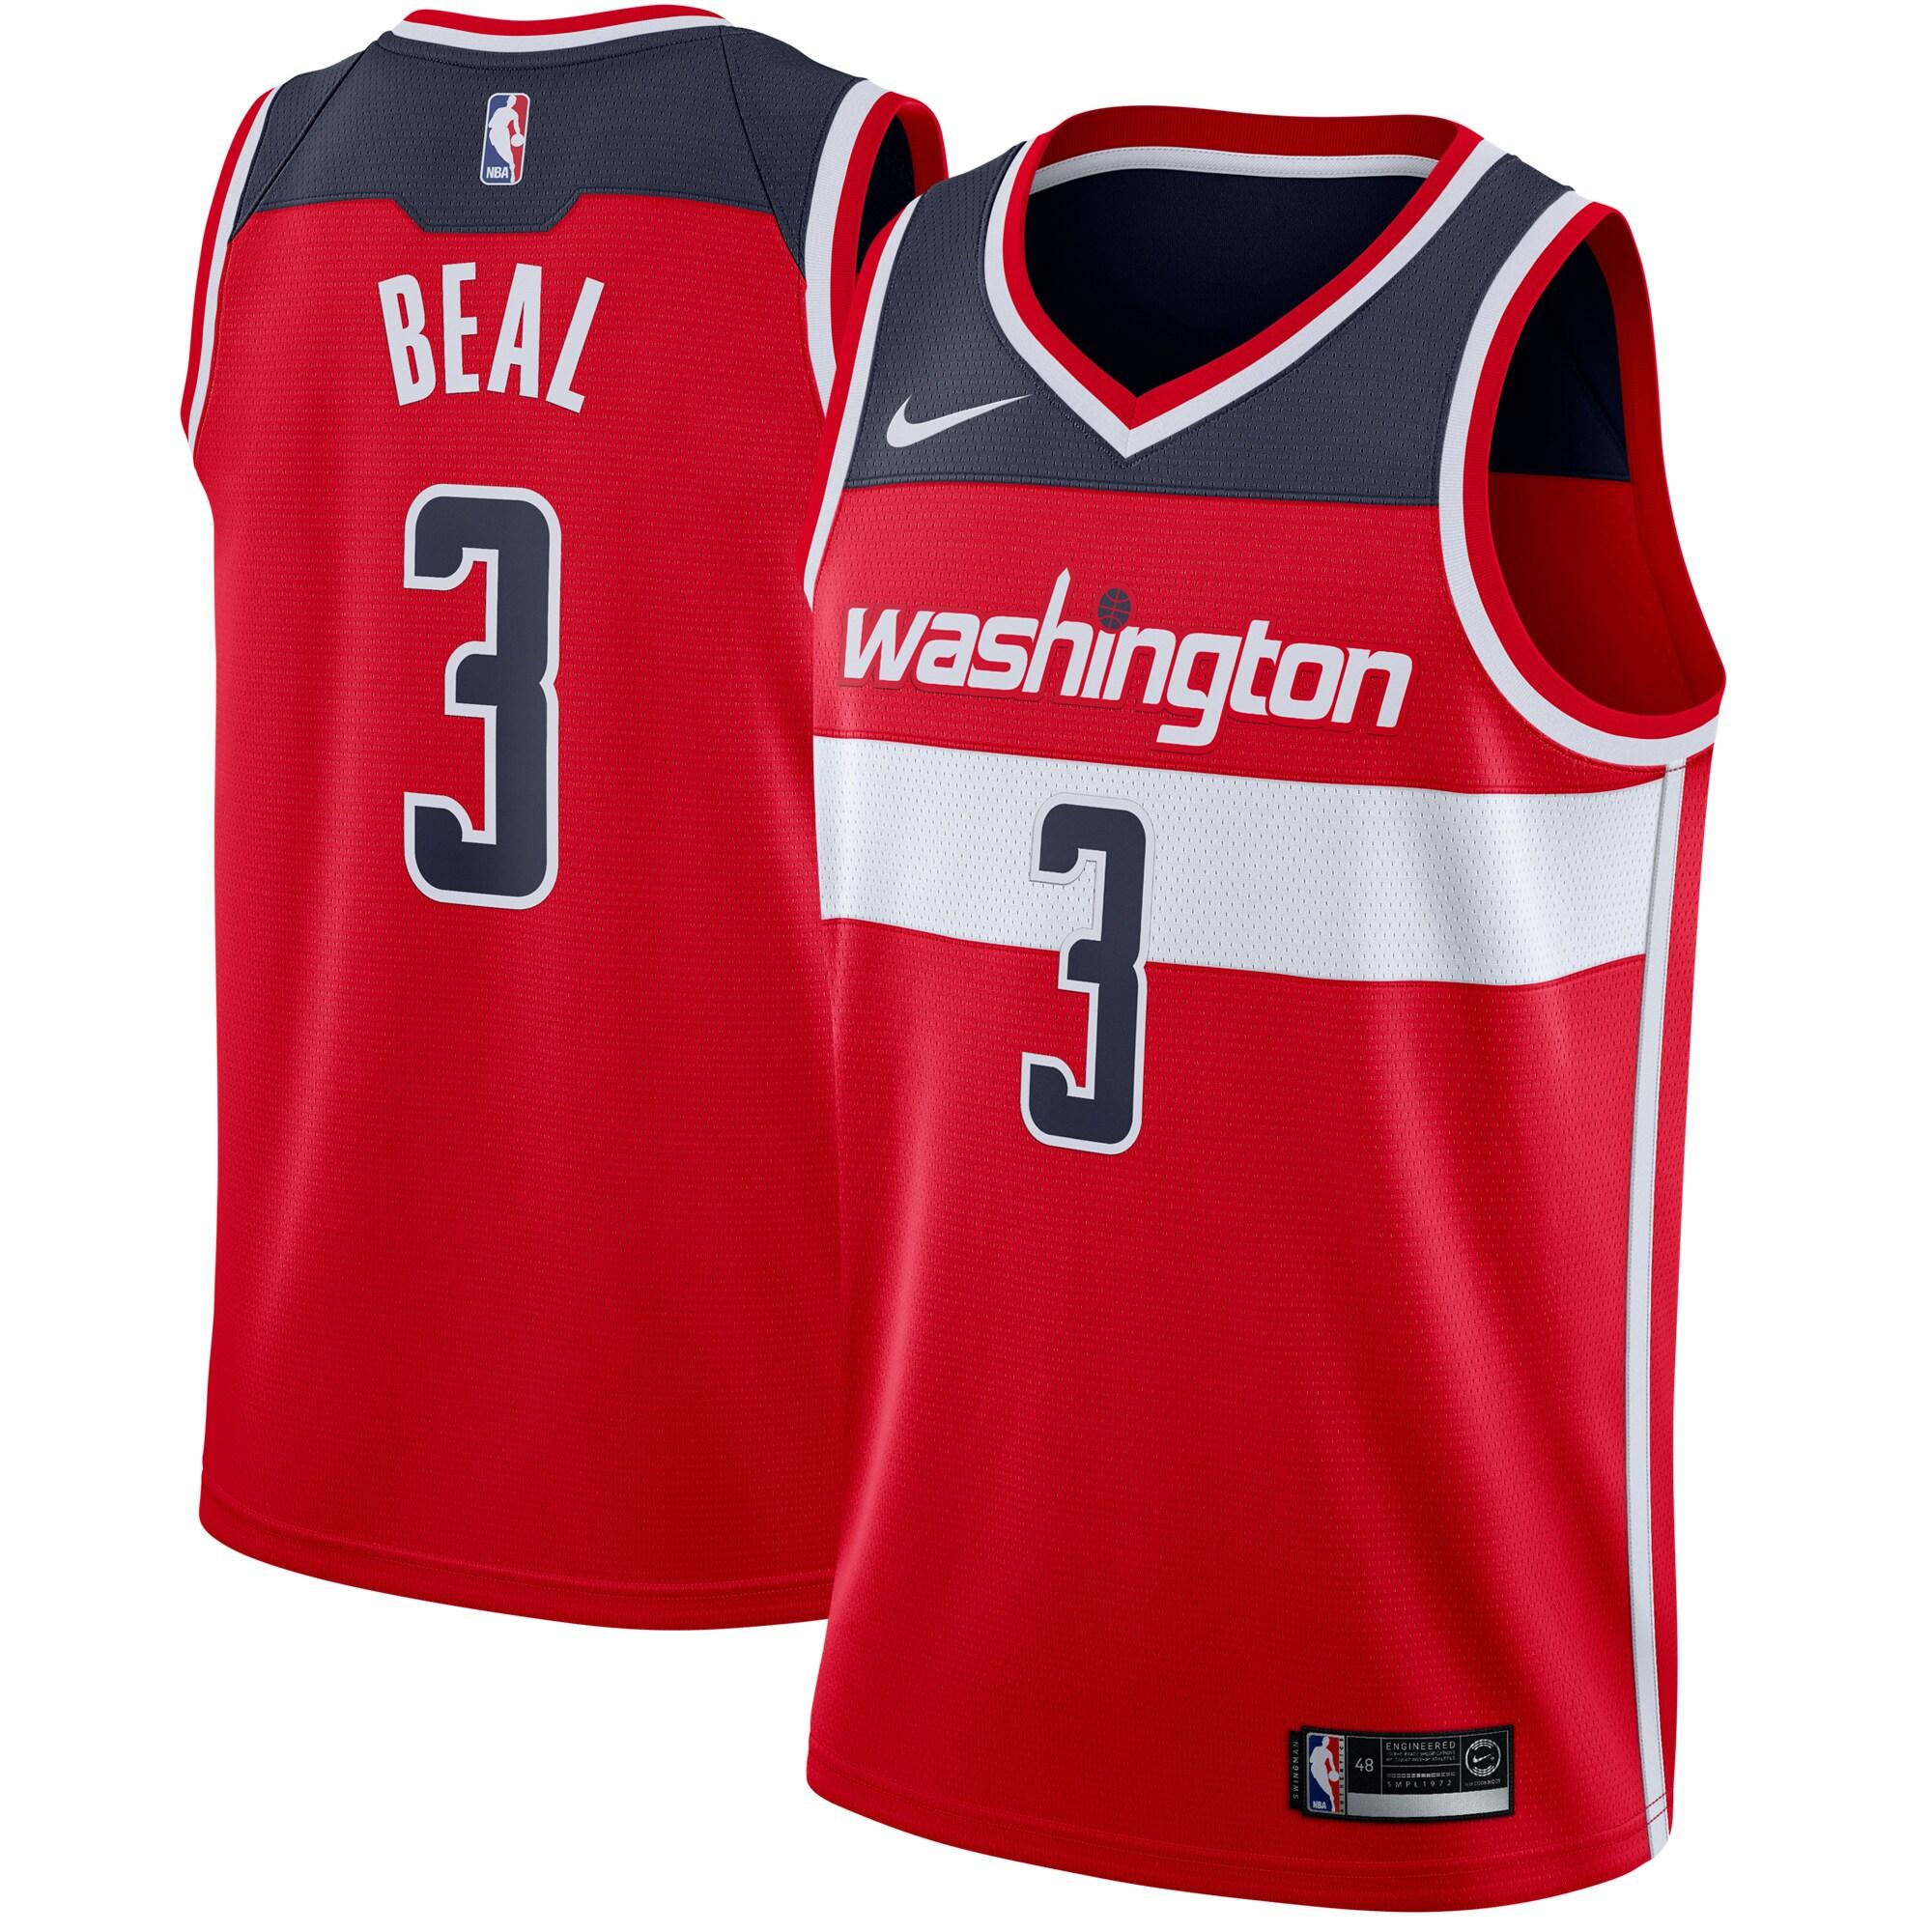 Bradley Beal Washington Wizards Nike Swingman Jersey Red - Icon Edition